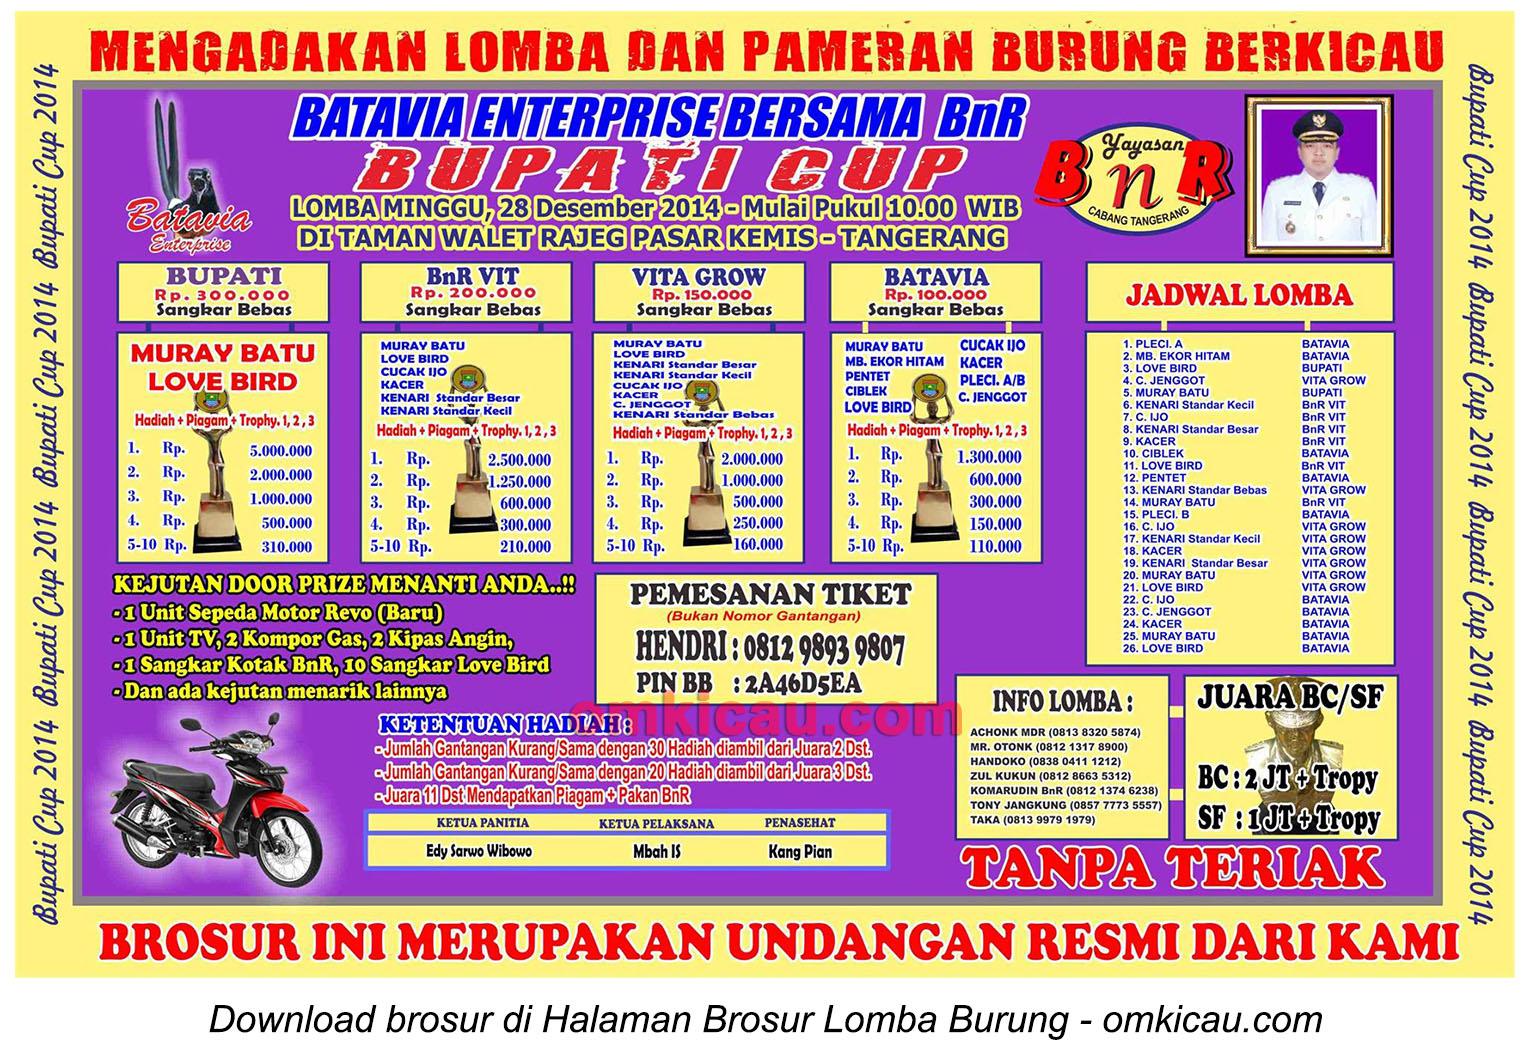 Brosur Lomba Burung Berkicau Bupati Cup, Tangerang, 28 Desember 2014